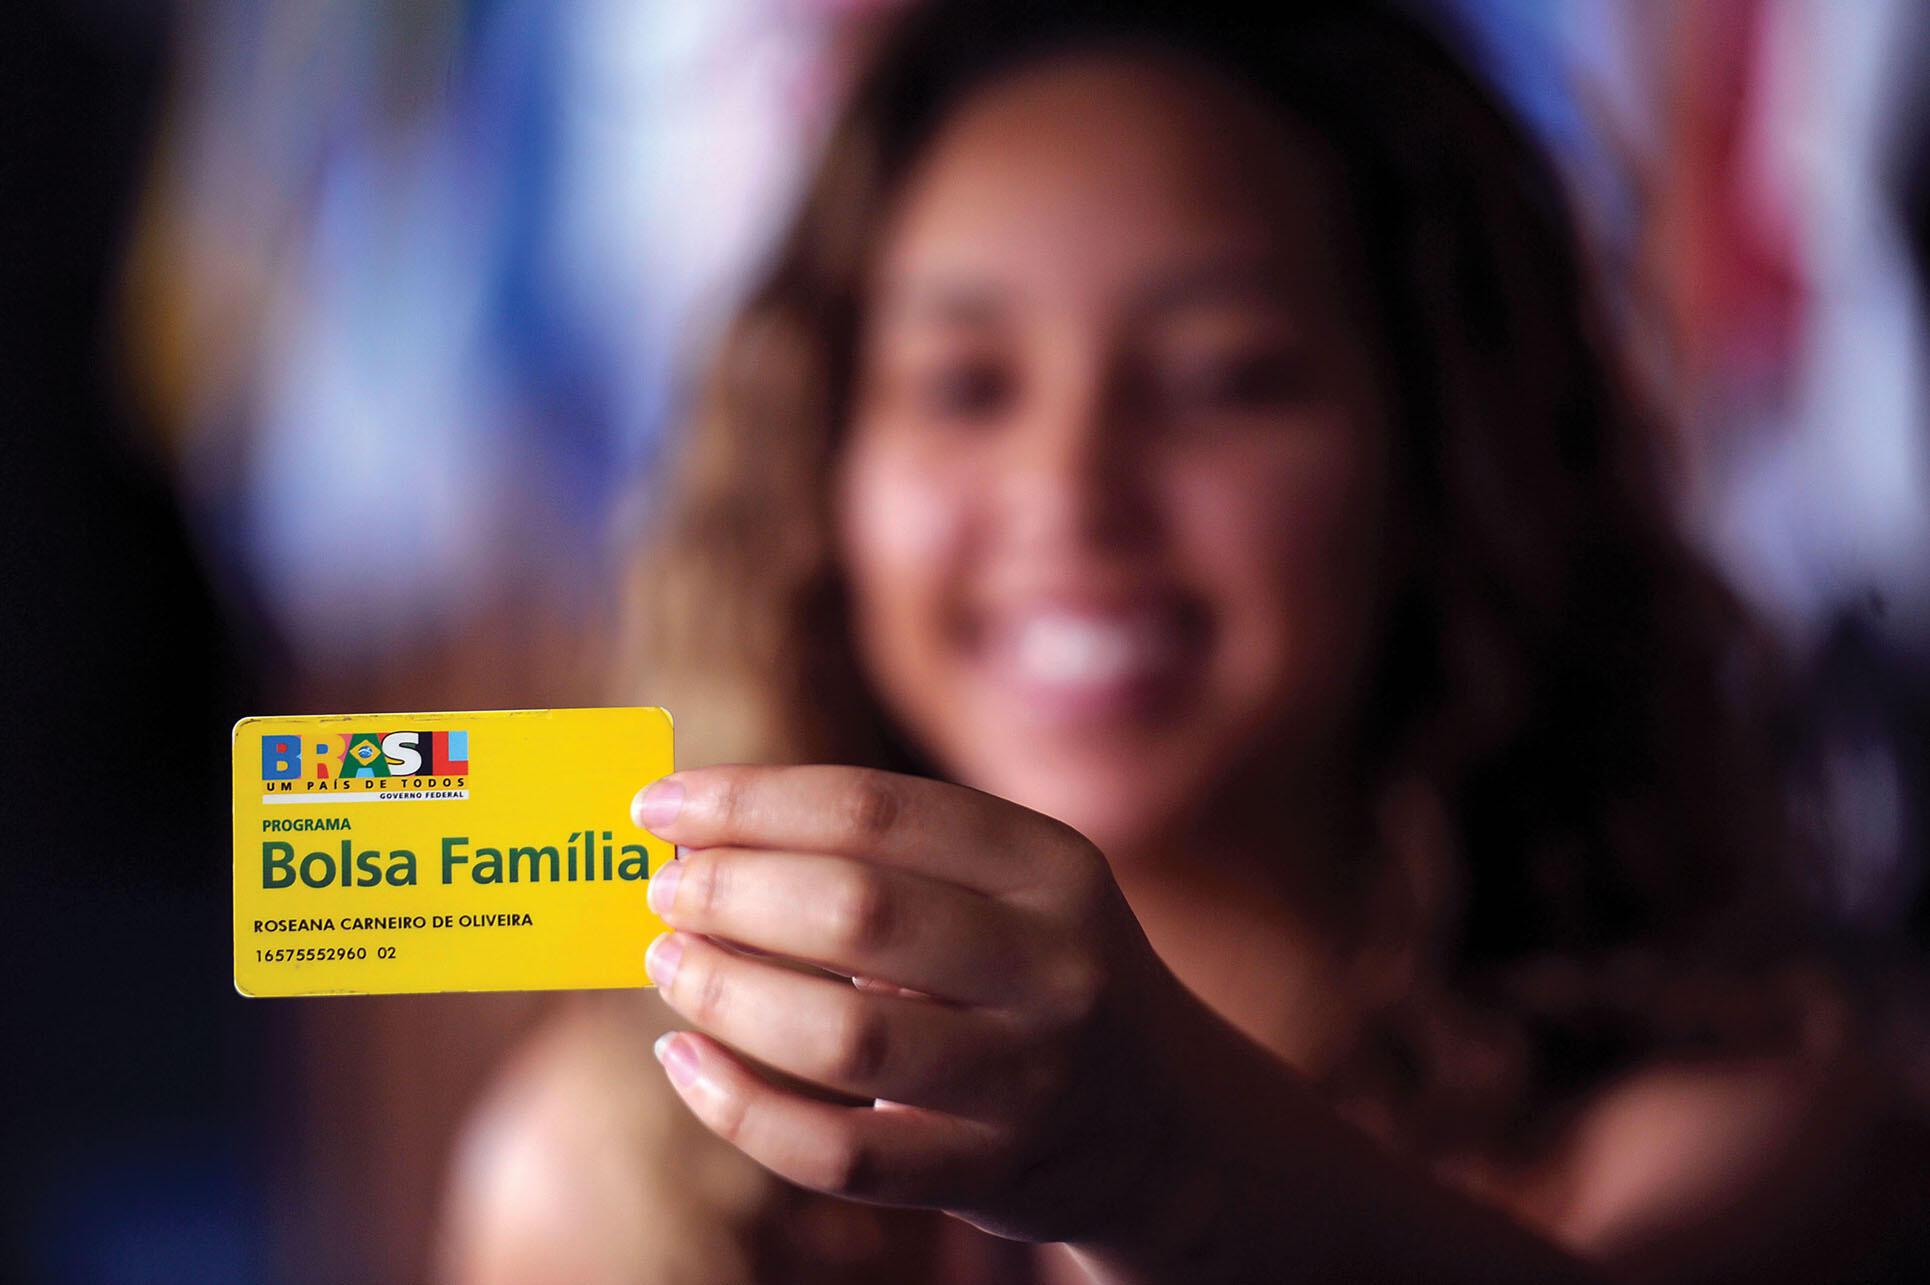 A woman holds up a Brazilian Bolsa Familia identification card in 2014. (Photo courtesy of Senado Federal do Brasil.)